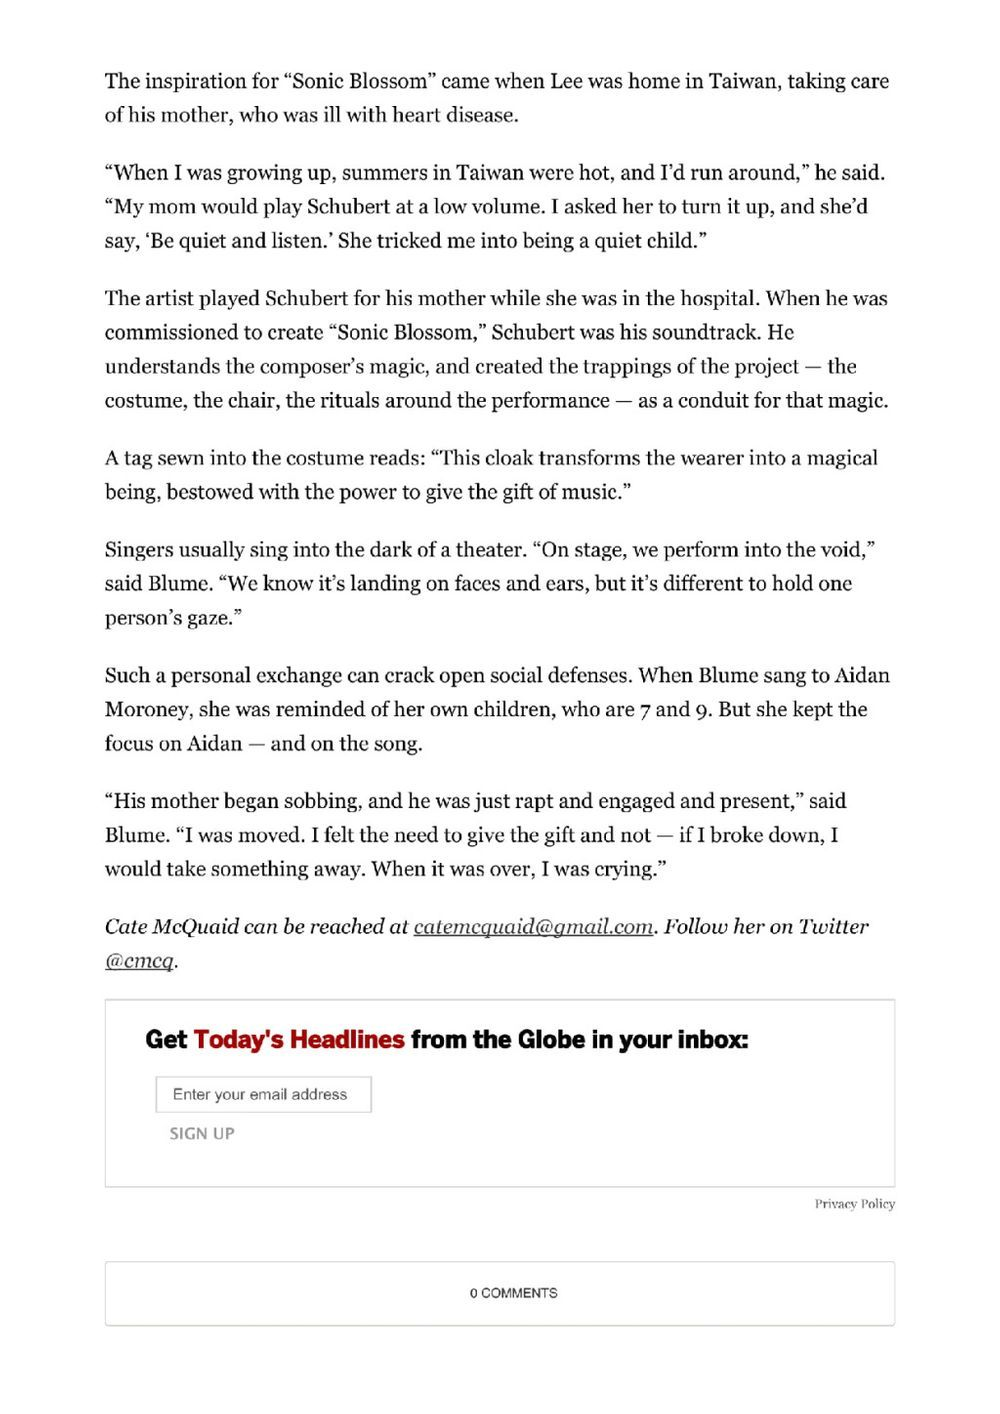 The Boston Globe | 李明維